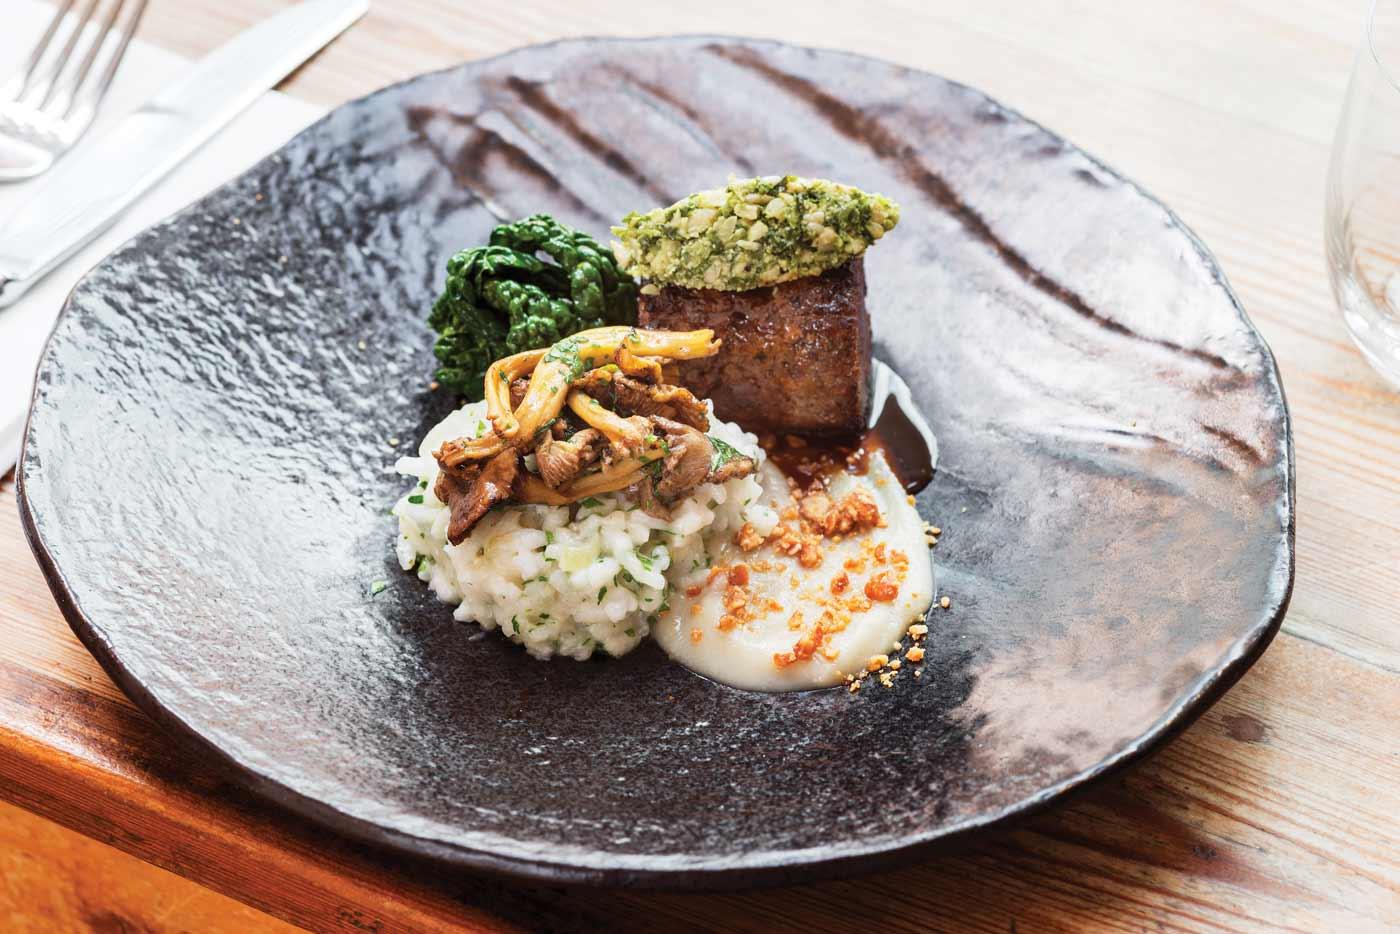 Rock Salt Cafe & Brasserie, Plymouth meal